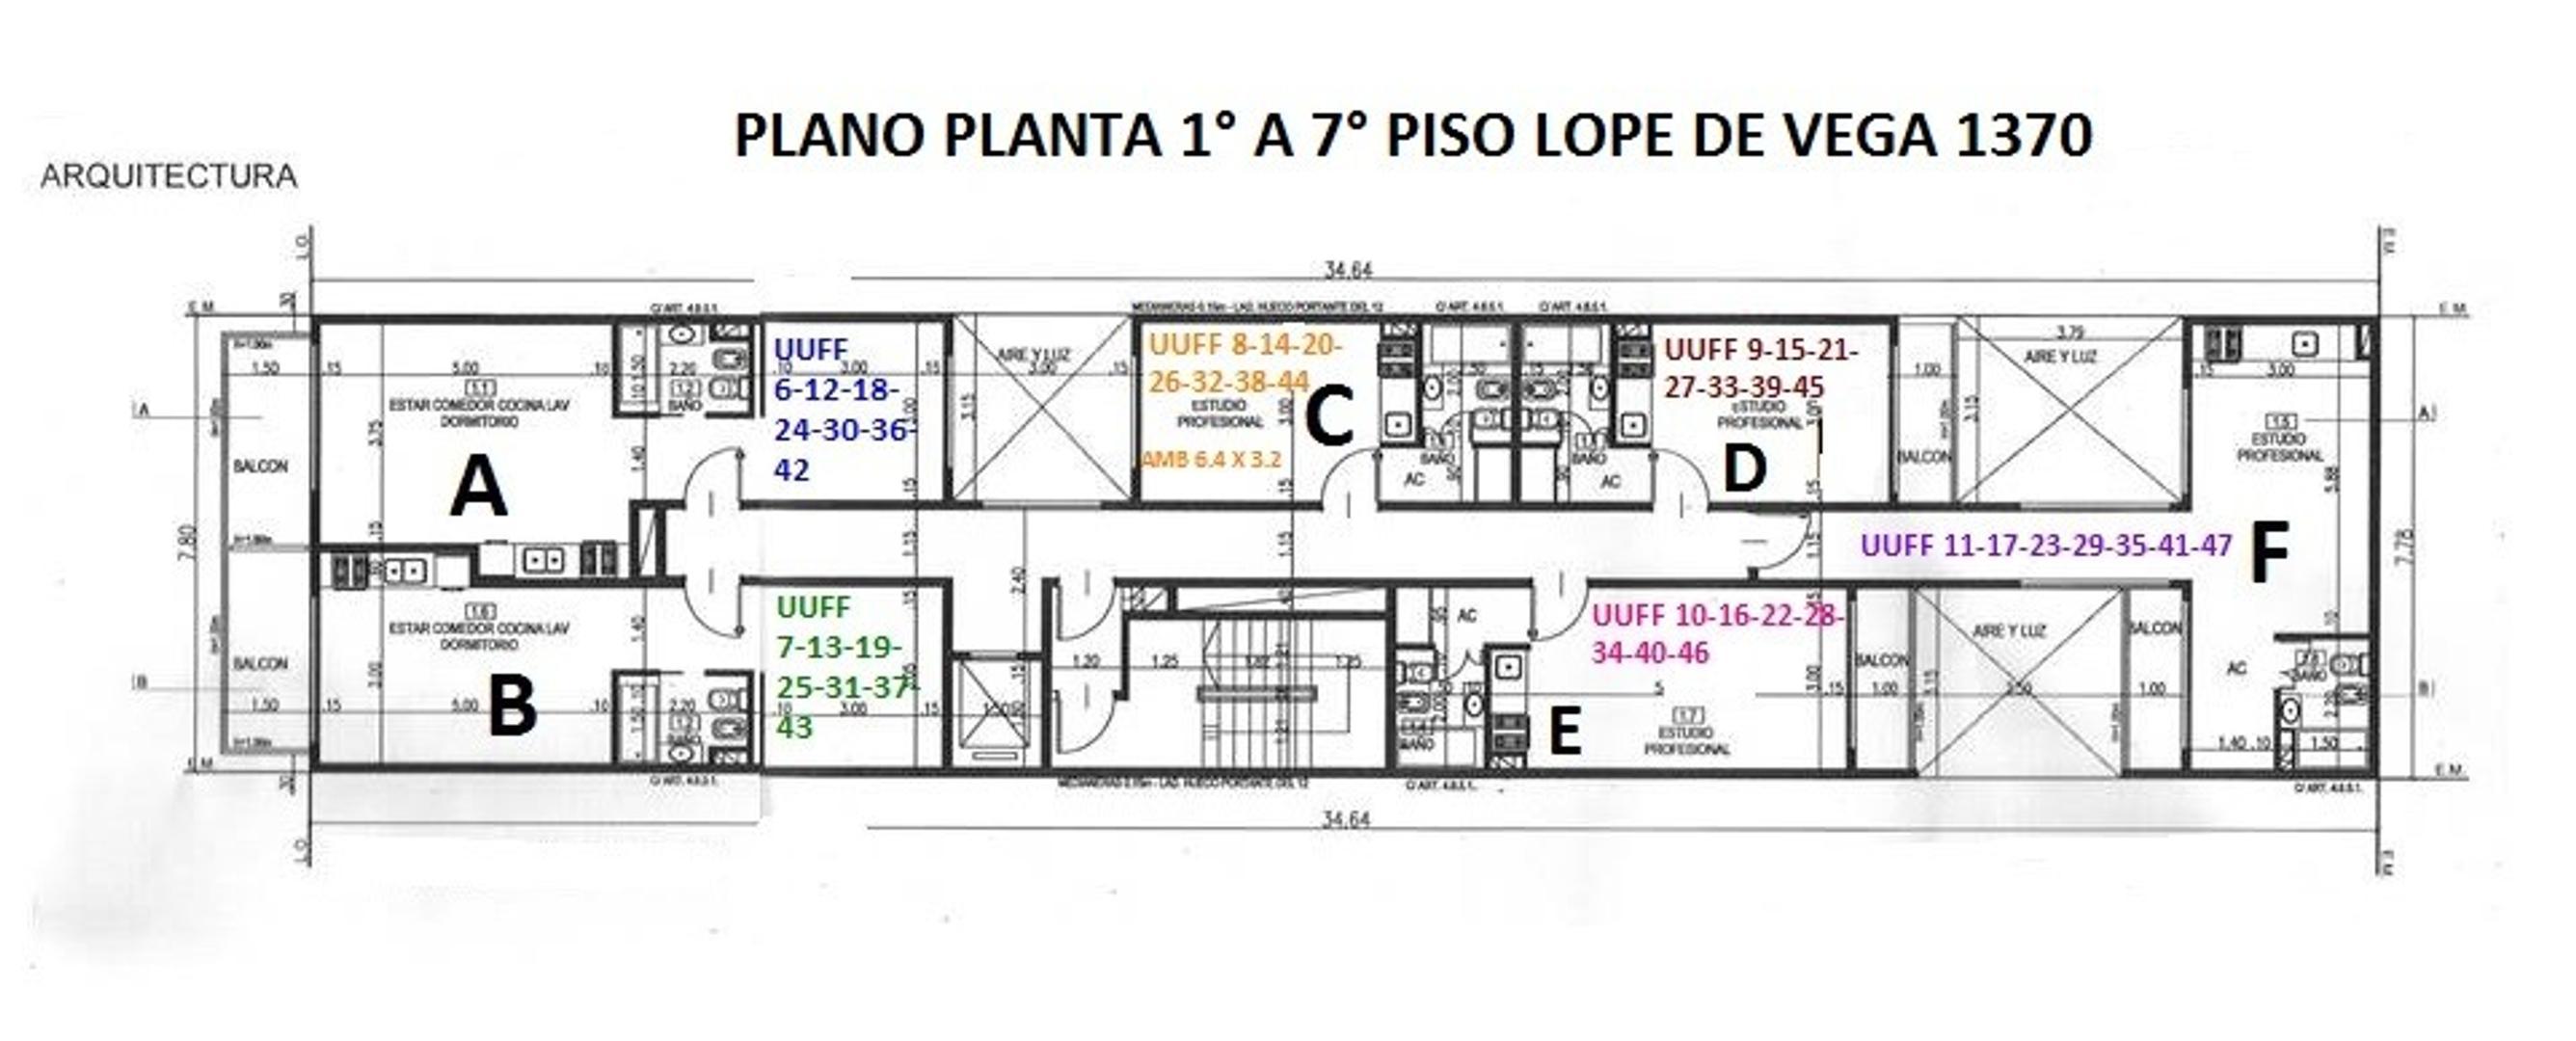 XINTEL(NIR-NIR-1022) Departamento - Venta - Argentina, Capital Federal - AV. LOPE DE VEGA  AL 1300